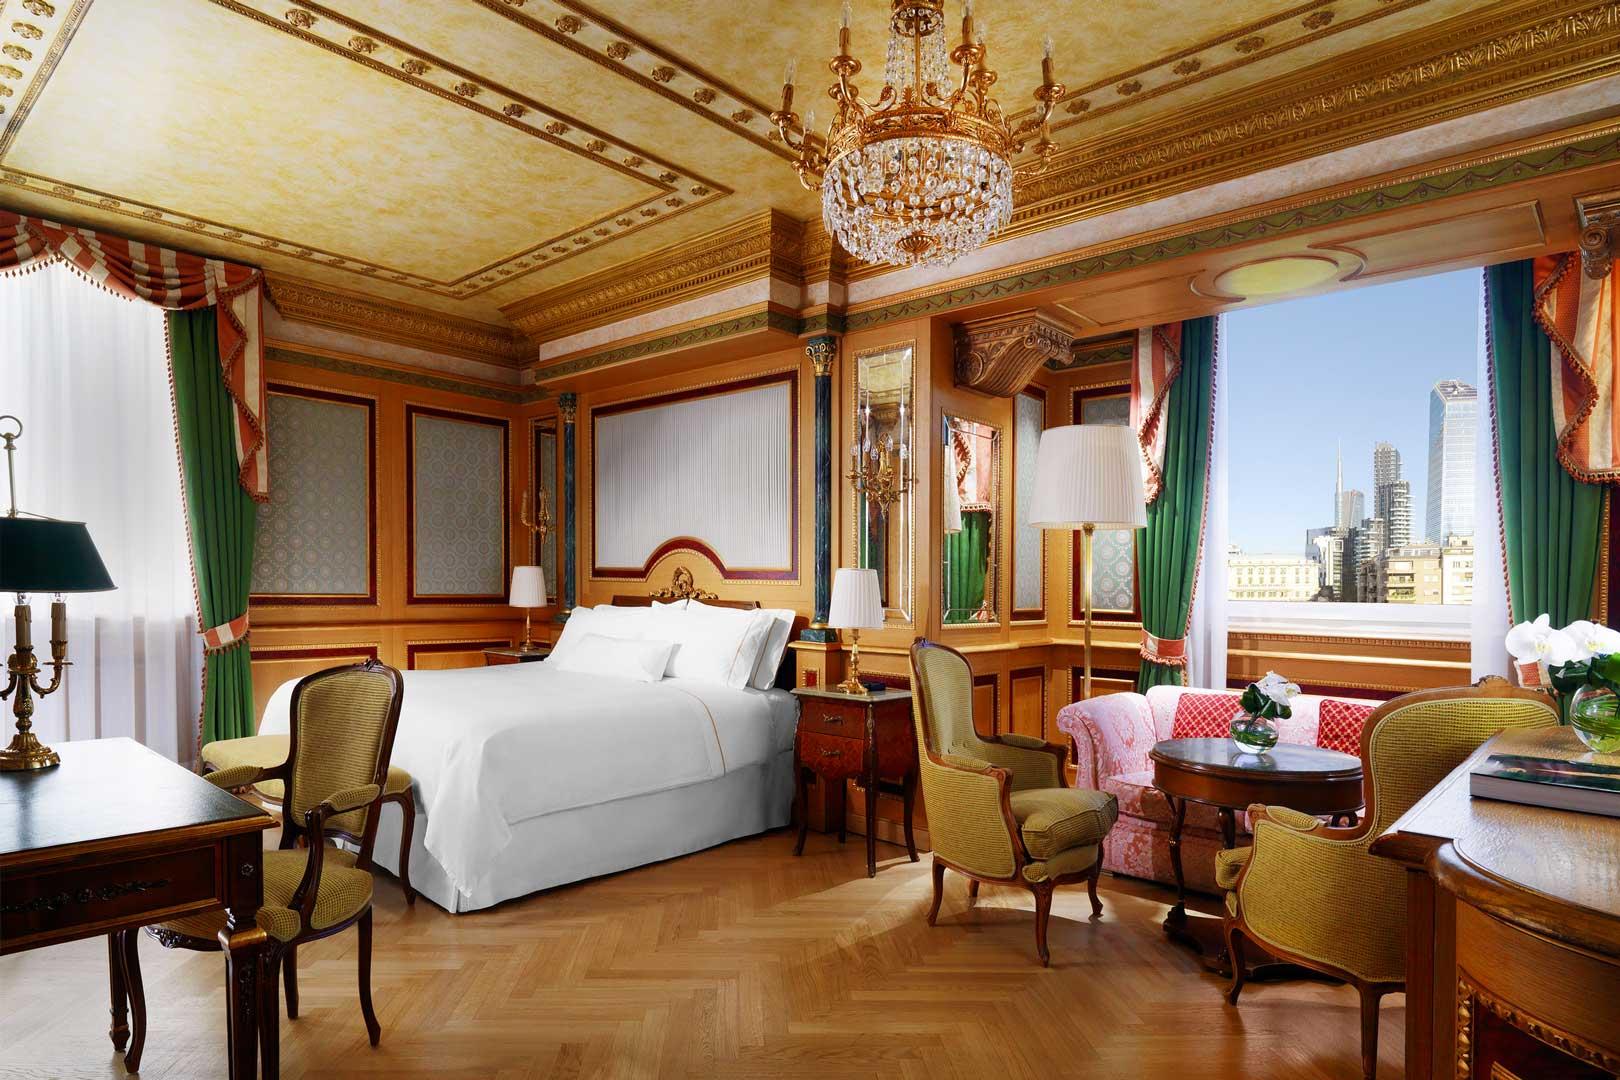 Grand Visconti Palace Hotel, Milan - tripadvisor.com